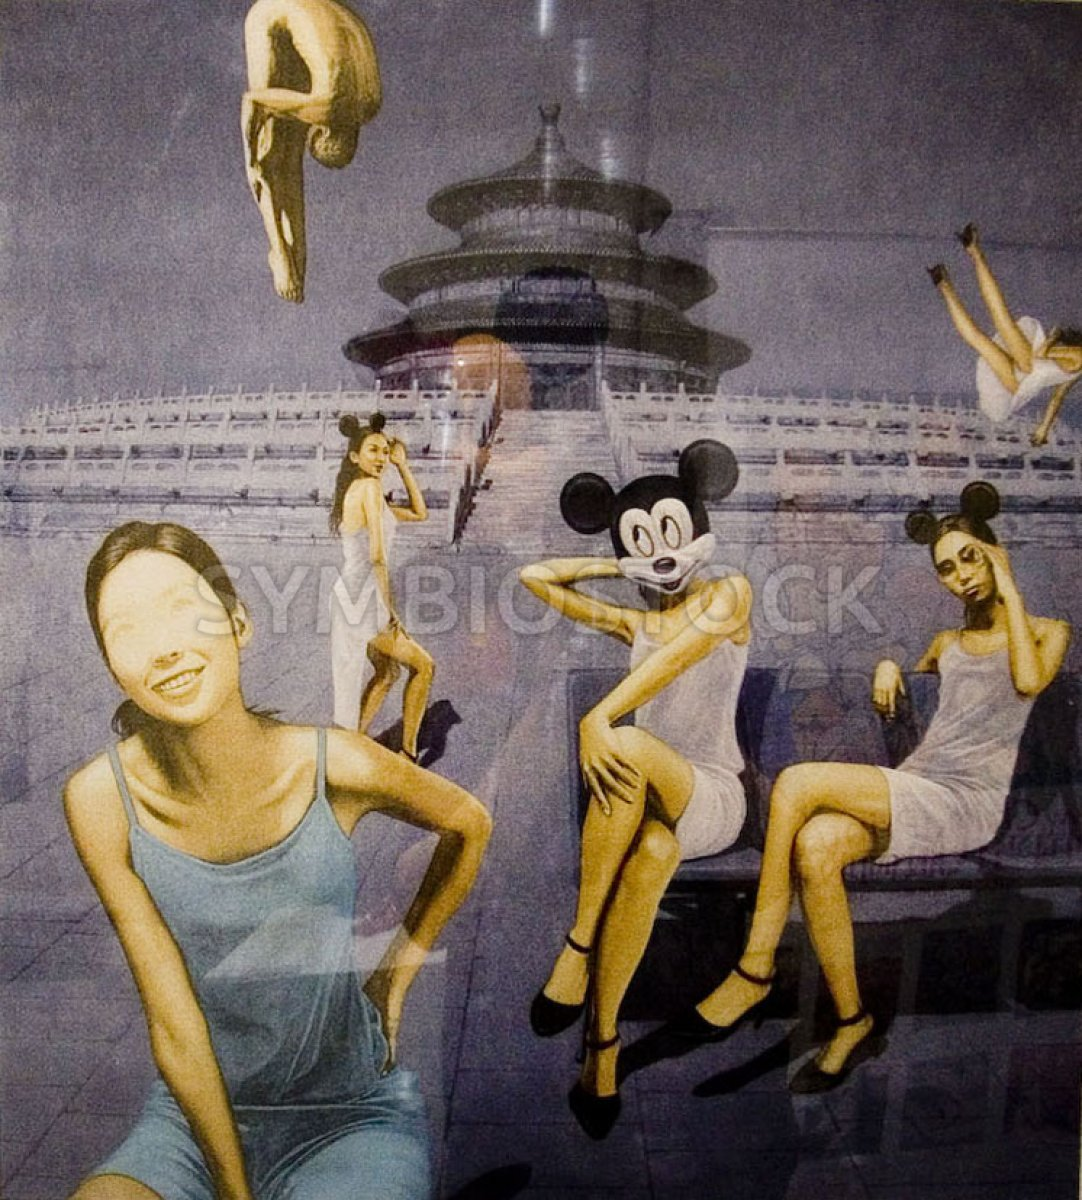 798-art-district-beijing-china_14500347919_o.jpg - davidmcb